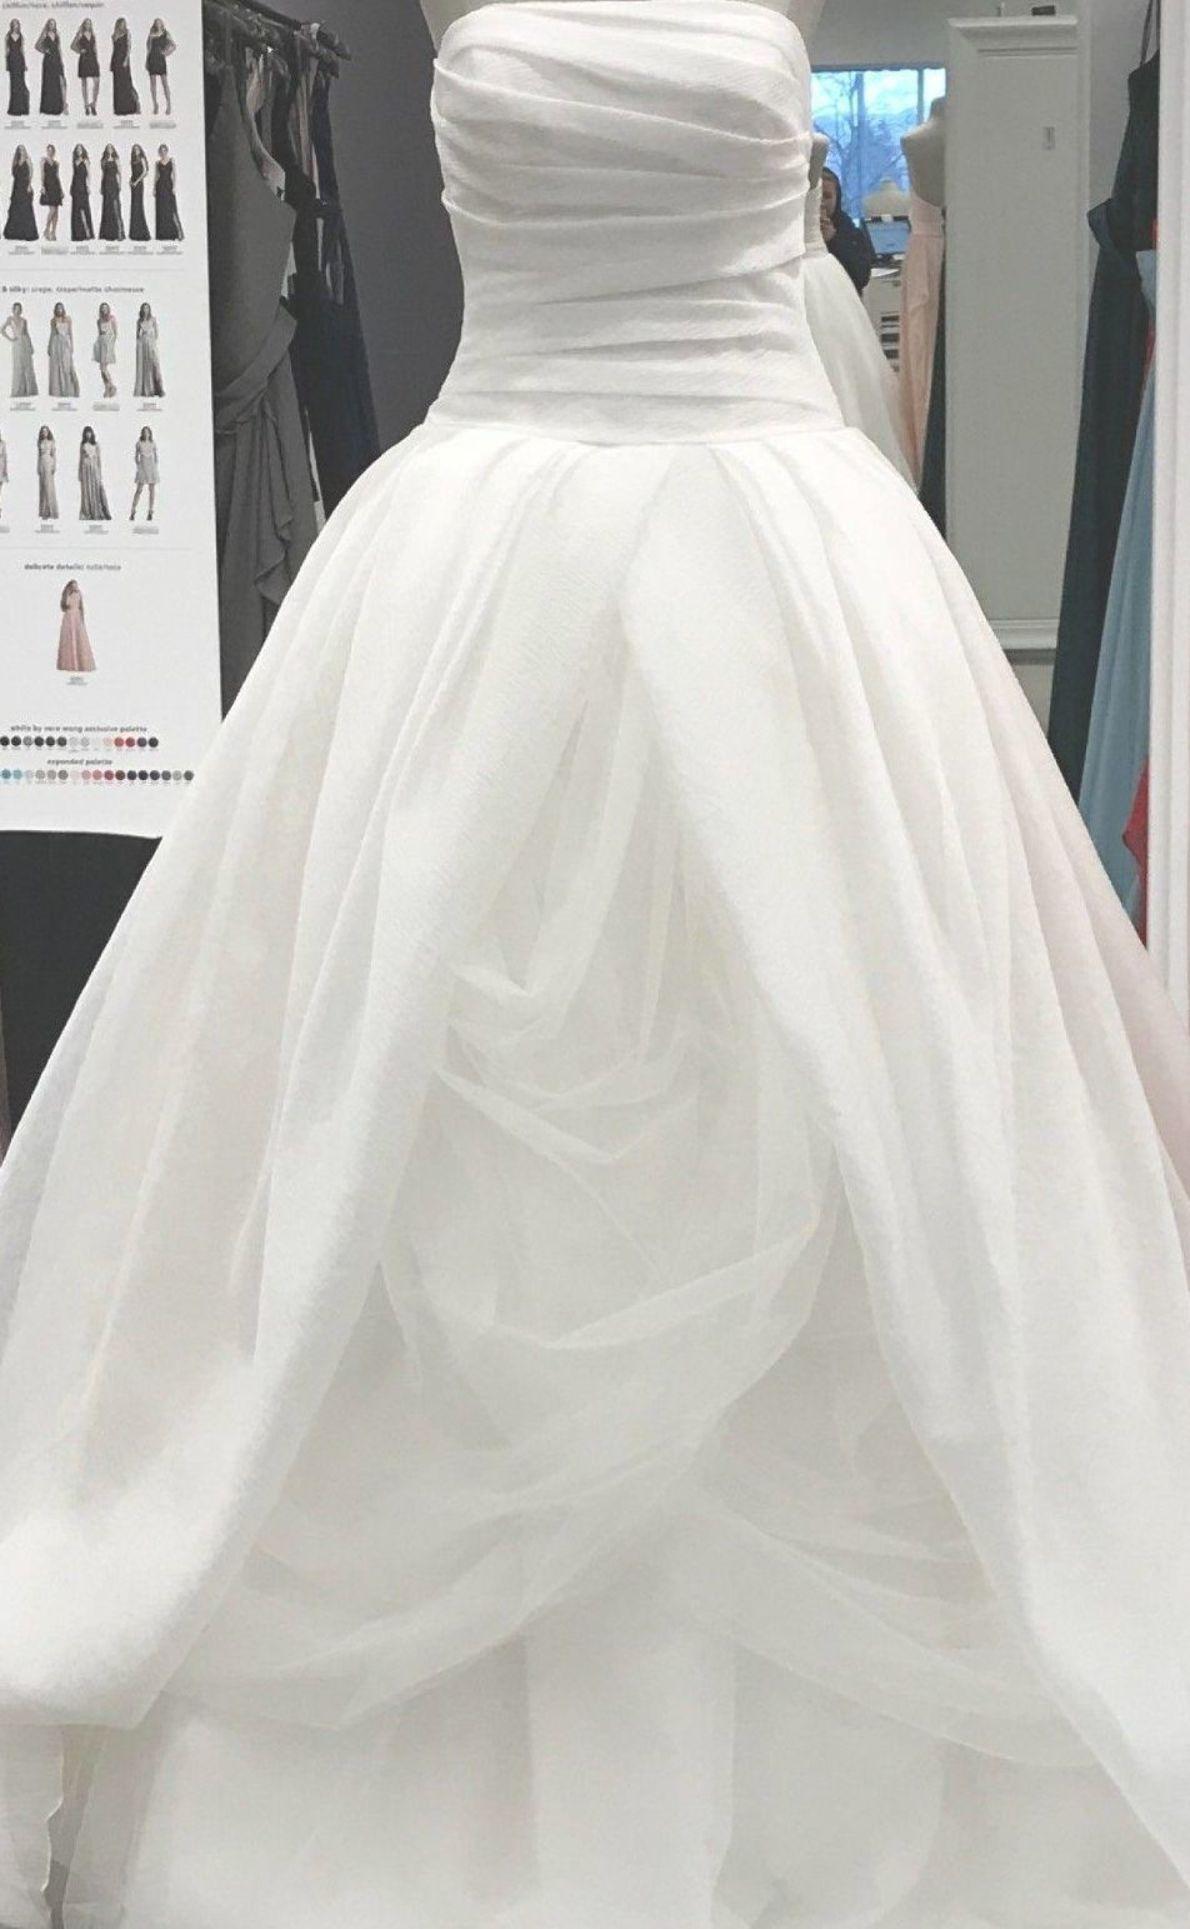 Vera Wang Hochzeitskleid  Wedding dresses vera wang, Vera wang